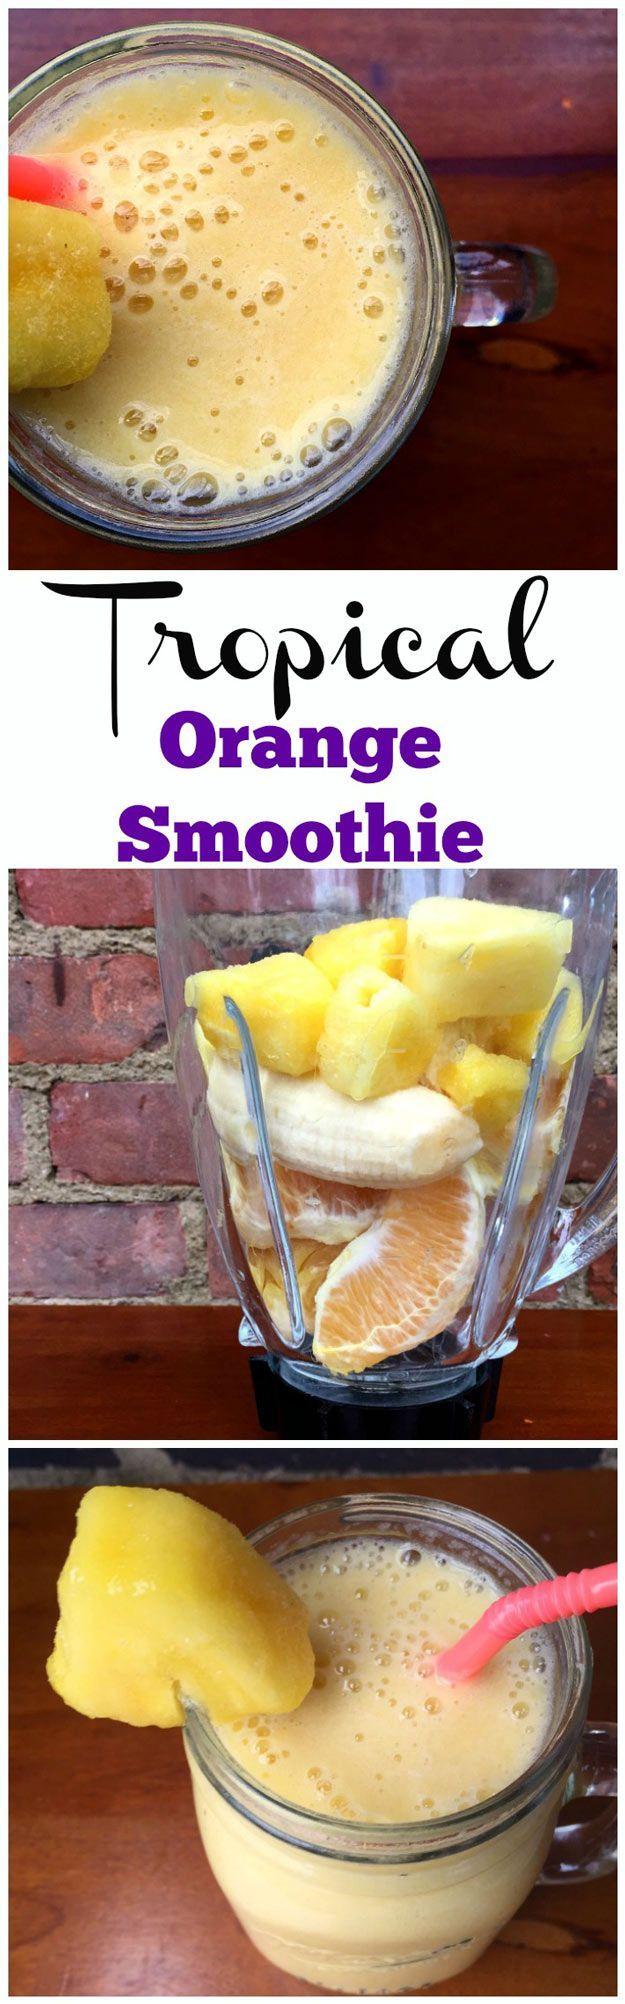 Beet juice help lose weight